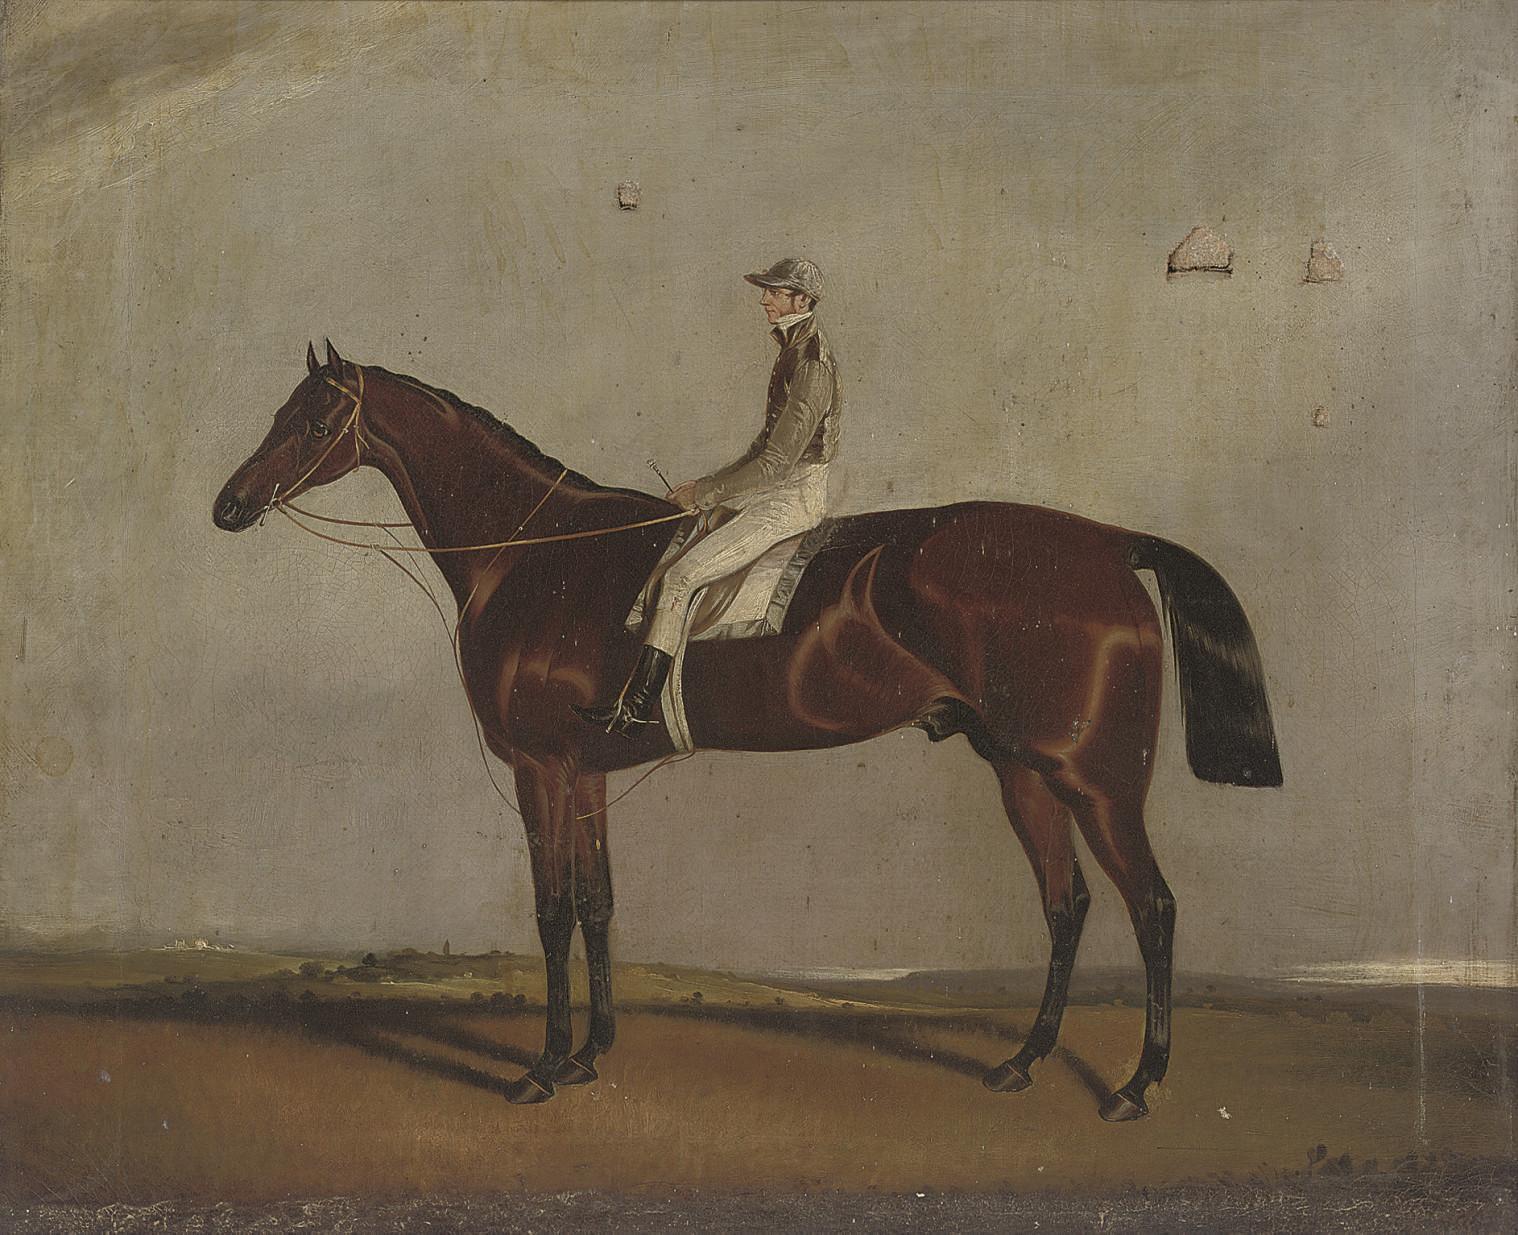 A chestnut with jockey up, a race course beyond